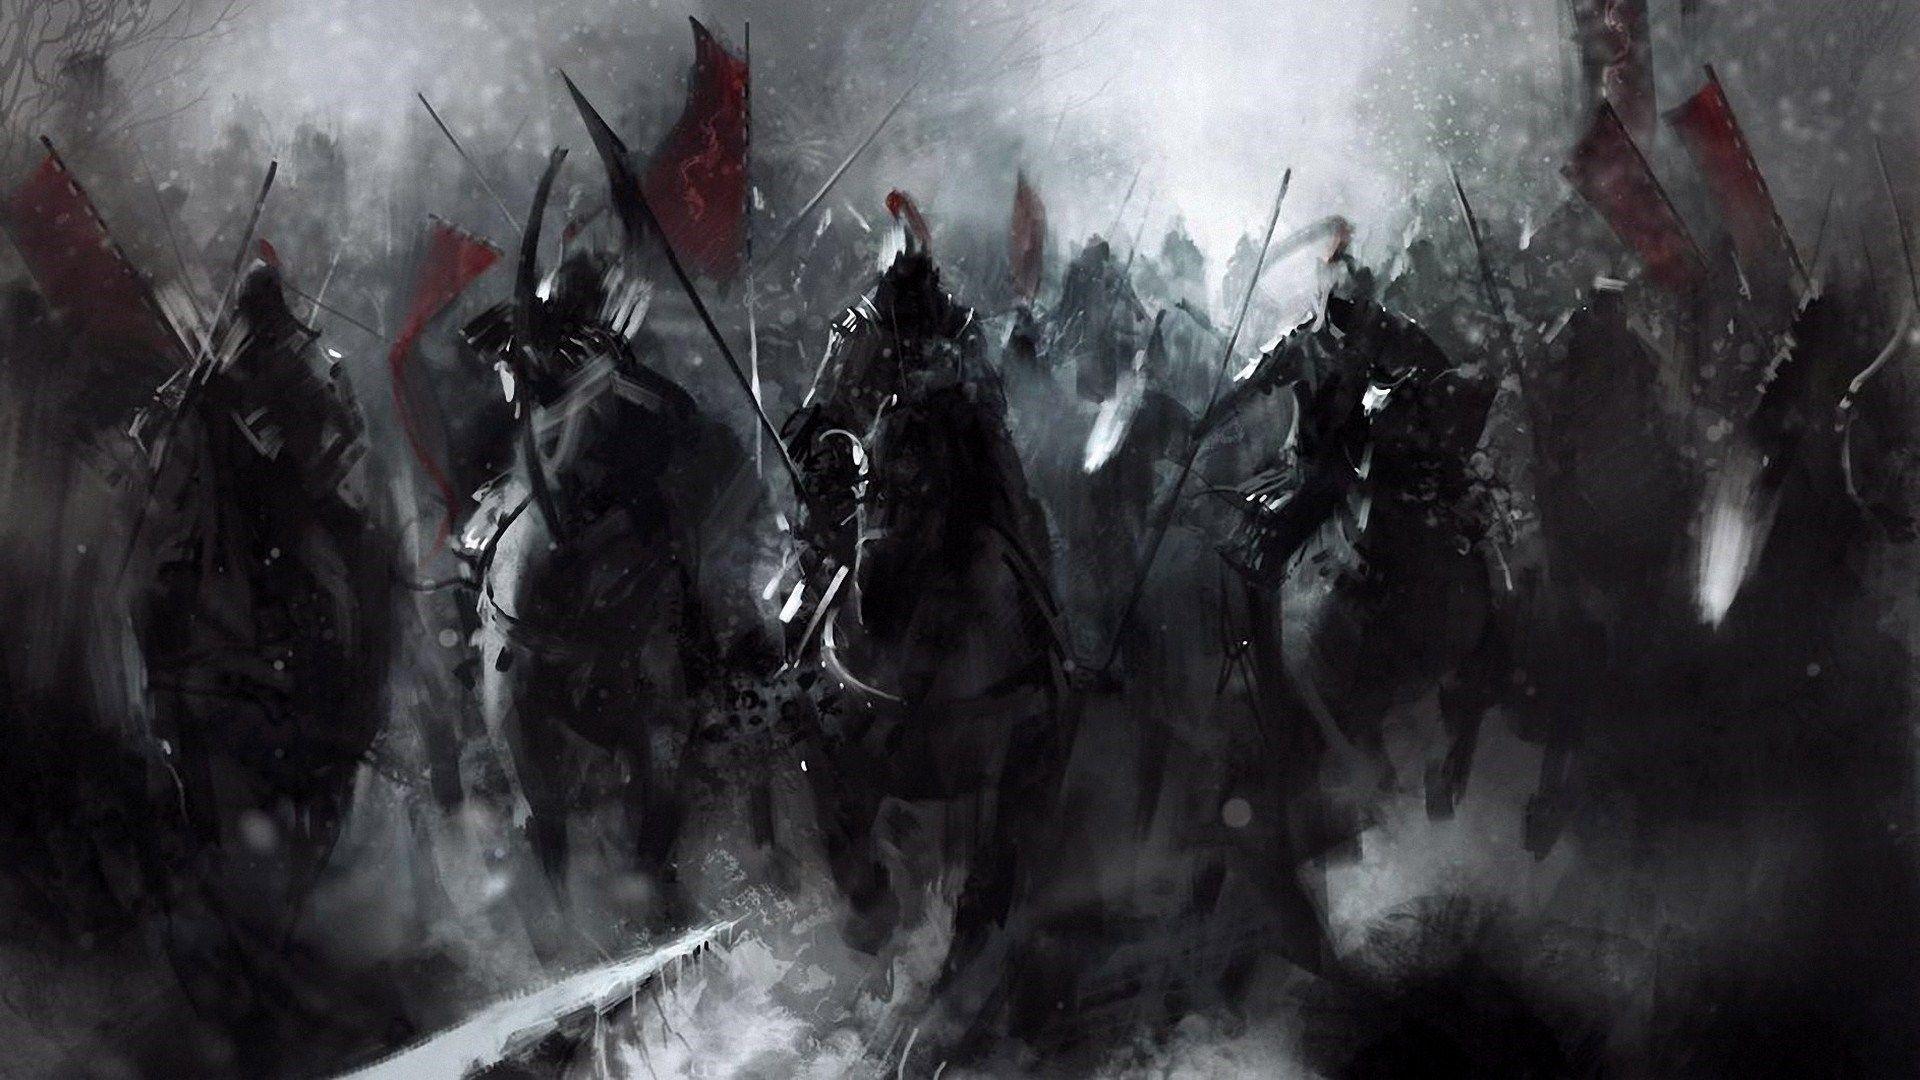 Simple Wallpaper Horse Warrior - 85550b867615dd01d4144f989398a9f4  Trends_6178100.jpg